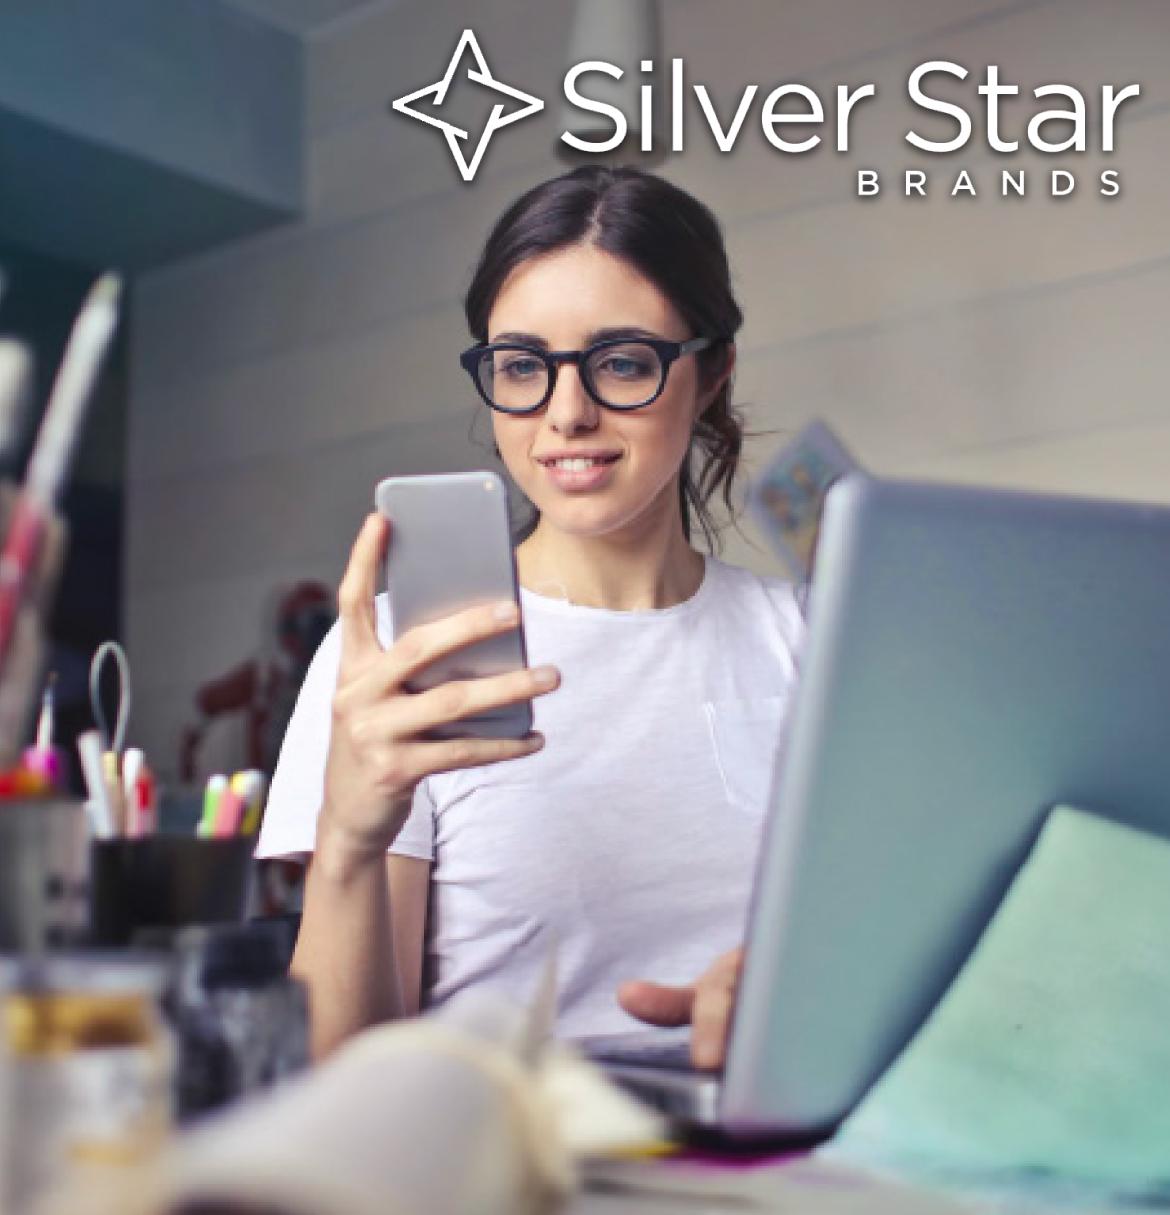 SilverStarBrands_LanderImage